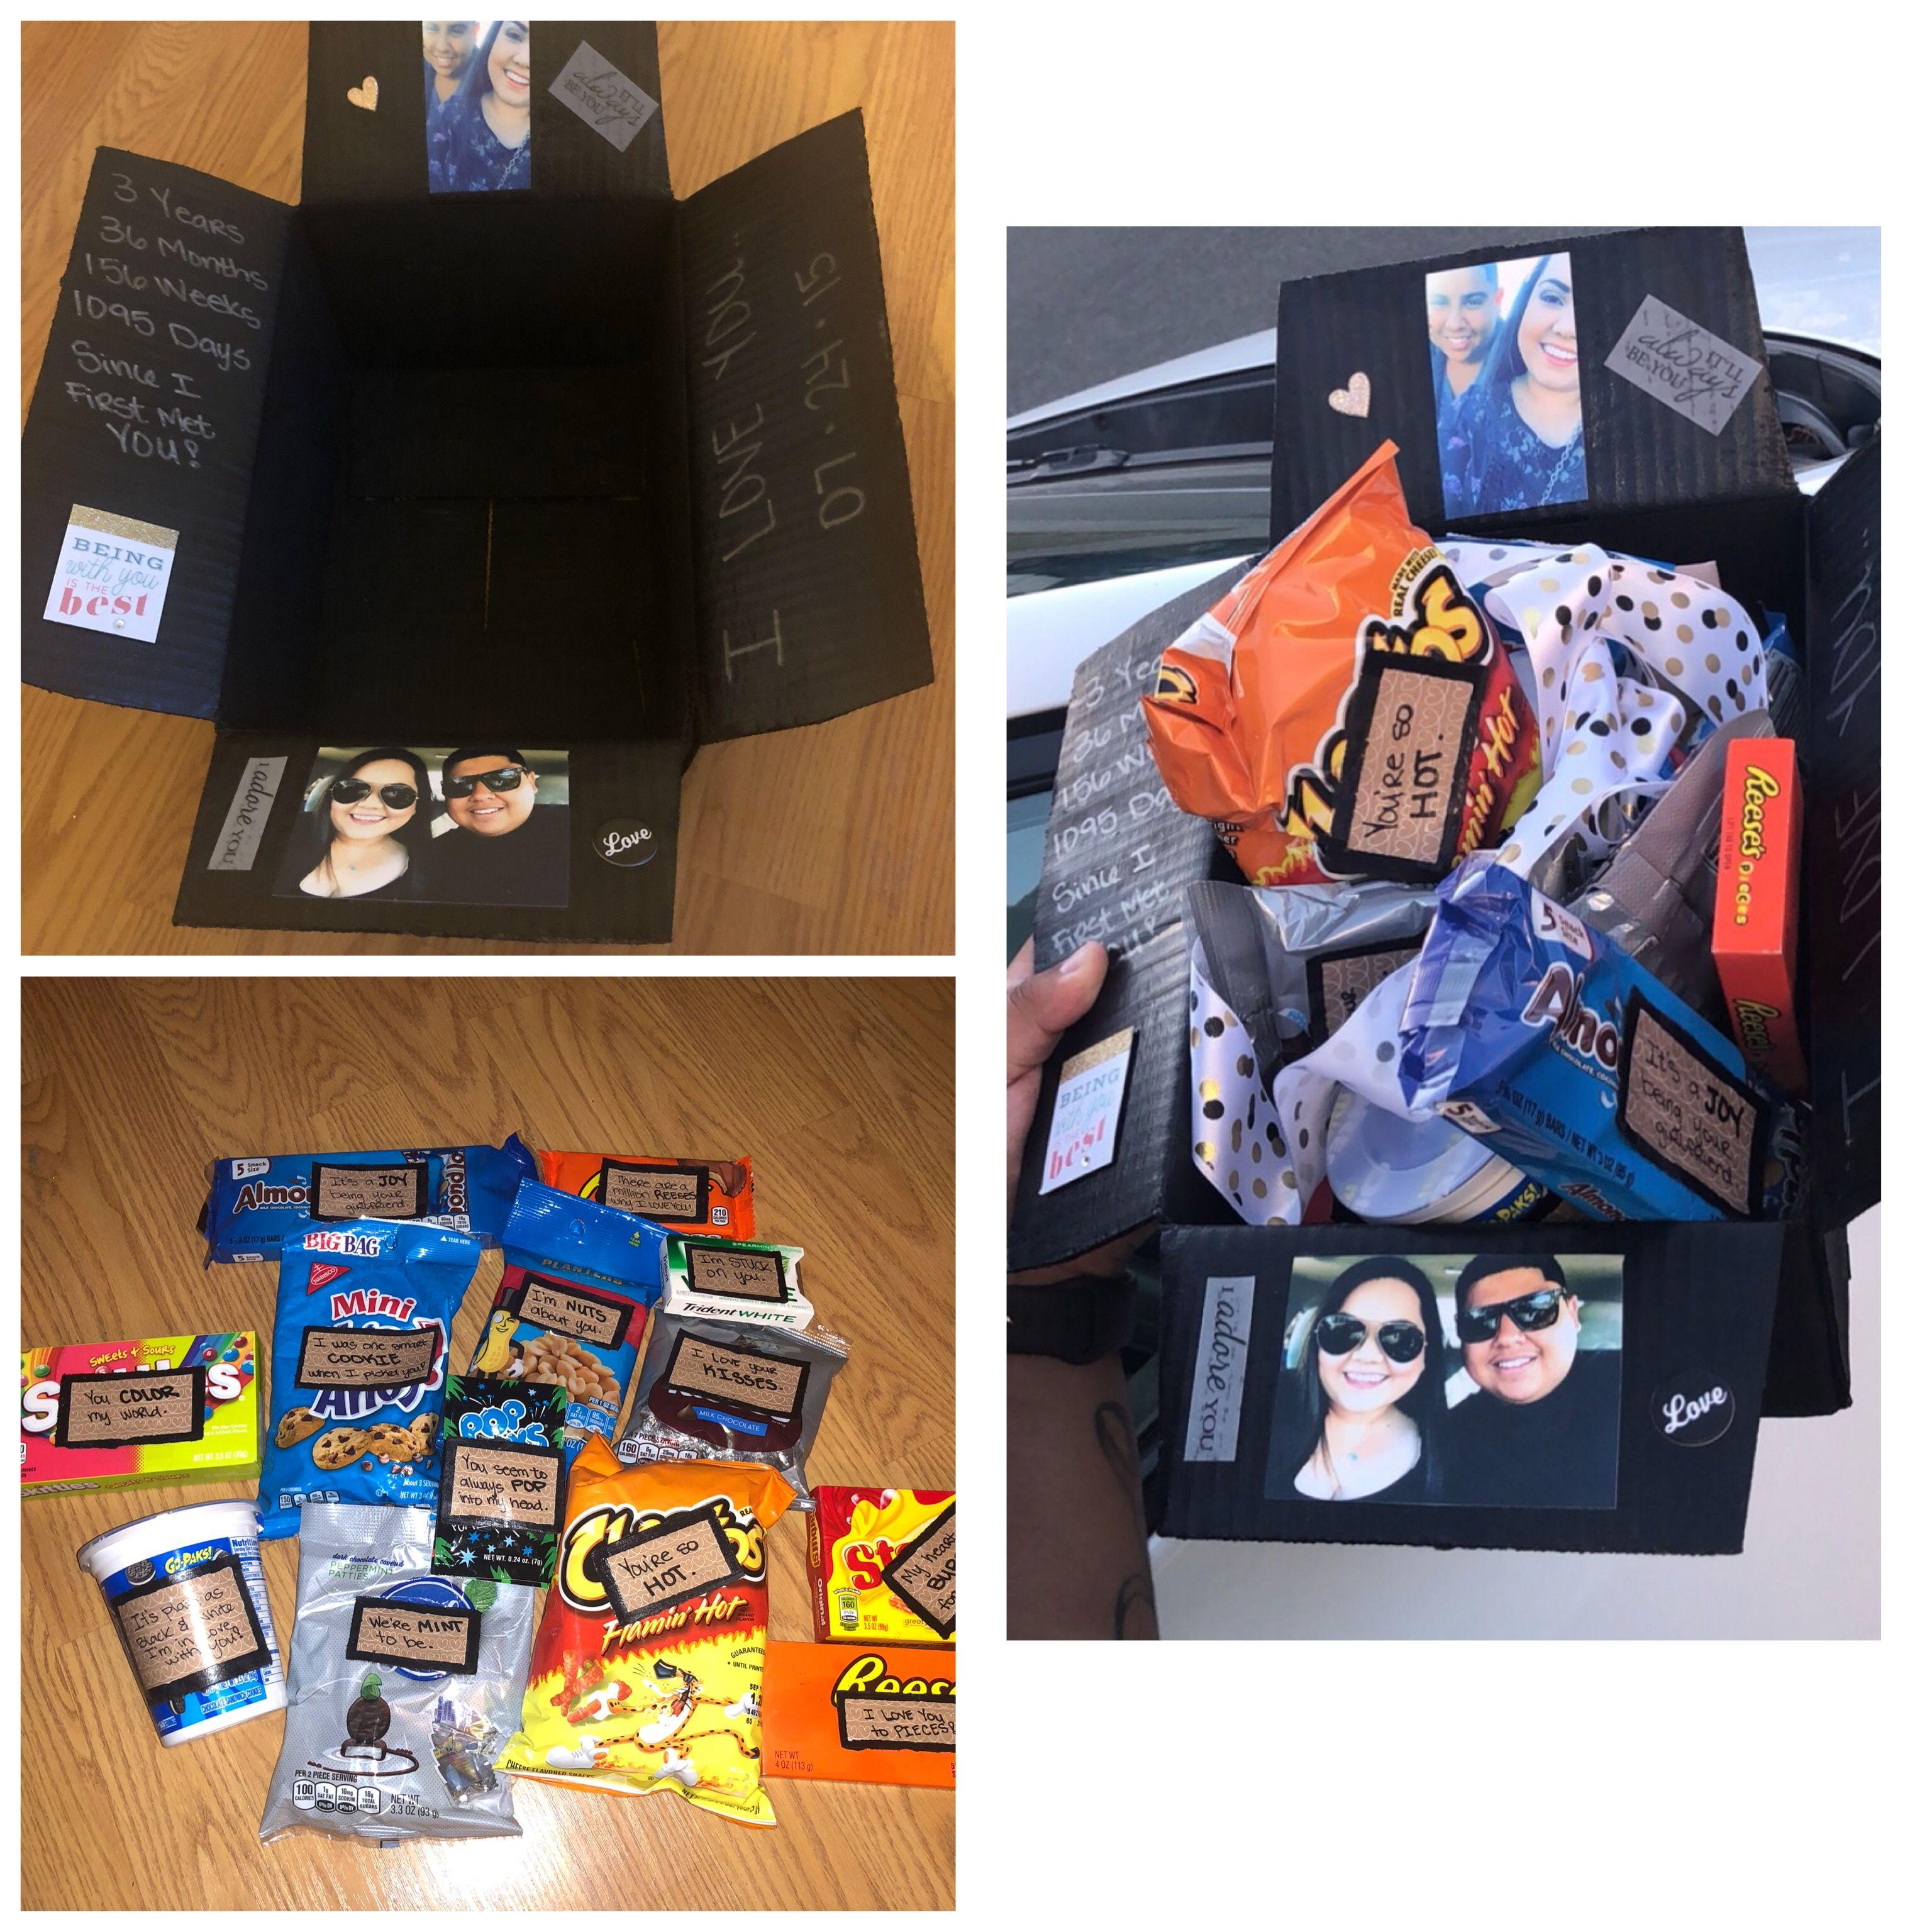 Candy Gift Idea Anniversary gift Boyfriend gift Birthday gift Candy puns  Swe… | Diy gifts for girlfriend, Diy gifts for boyfriend, Birthday gifts  for boyfriend diy